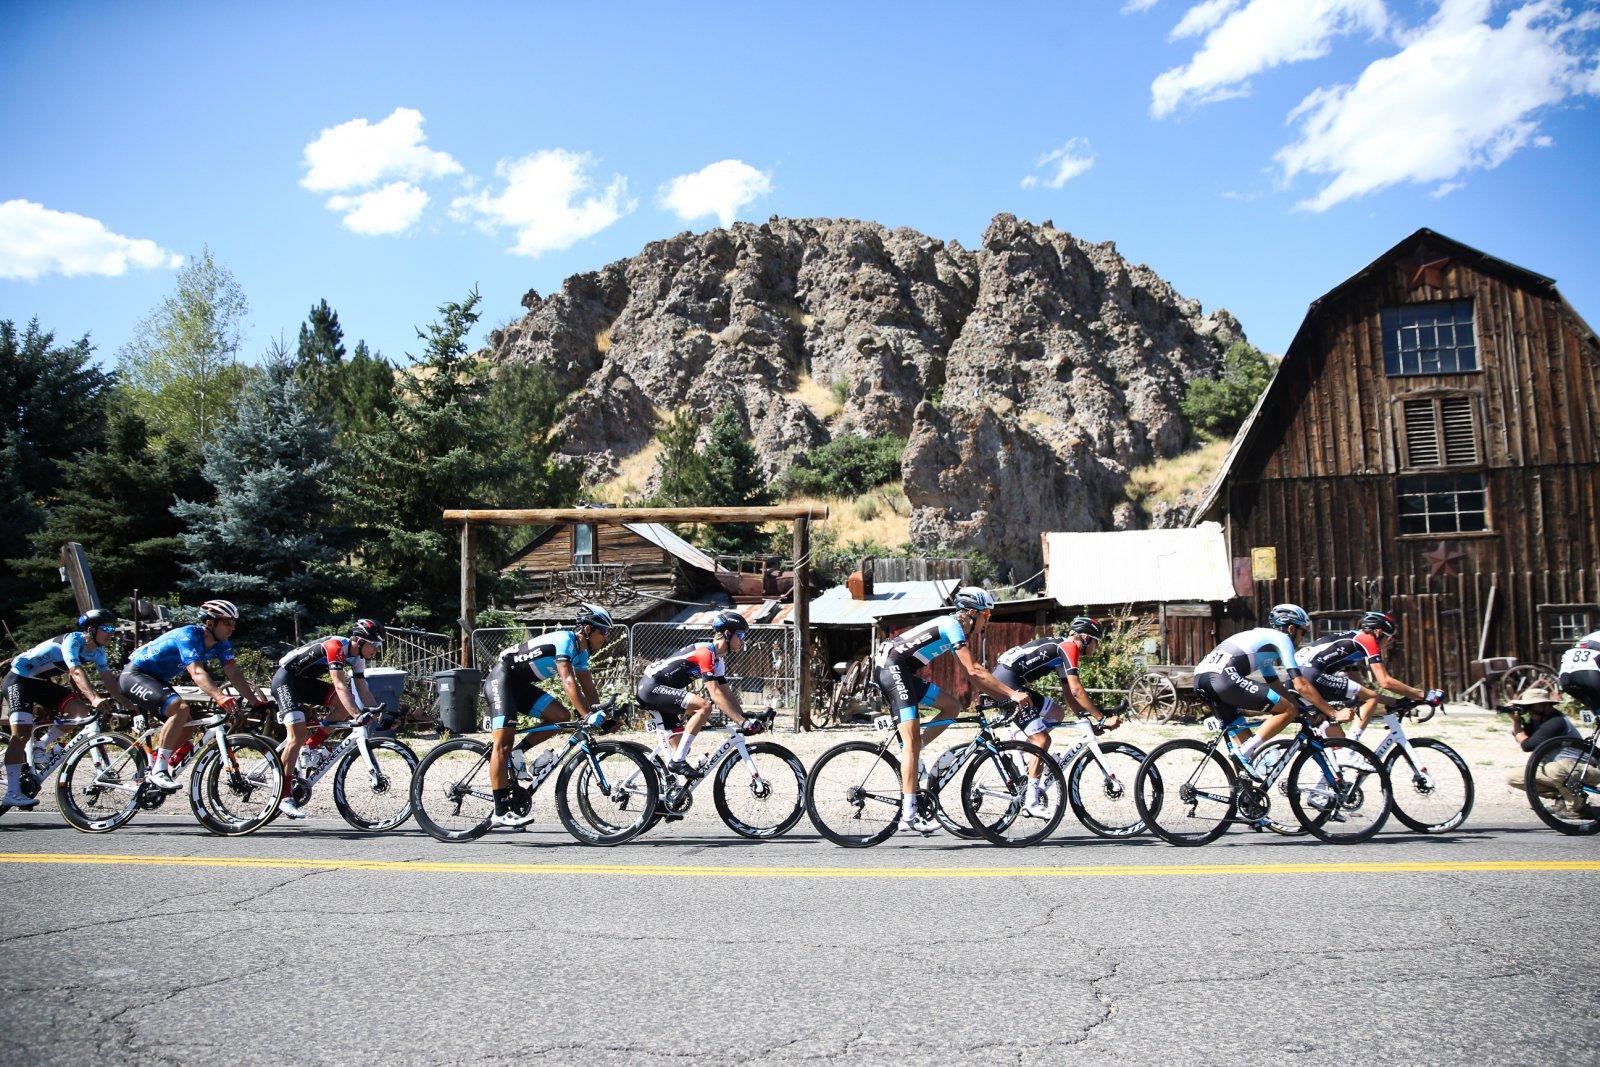 The peloton did a loop around Wanship.